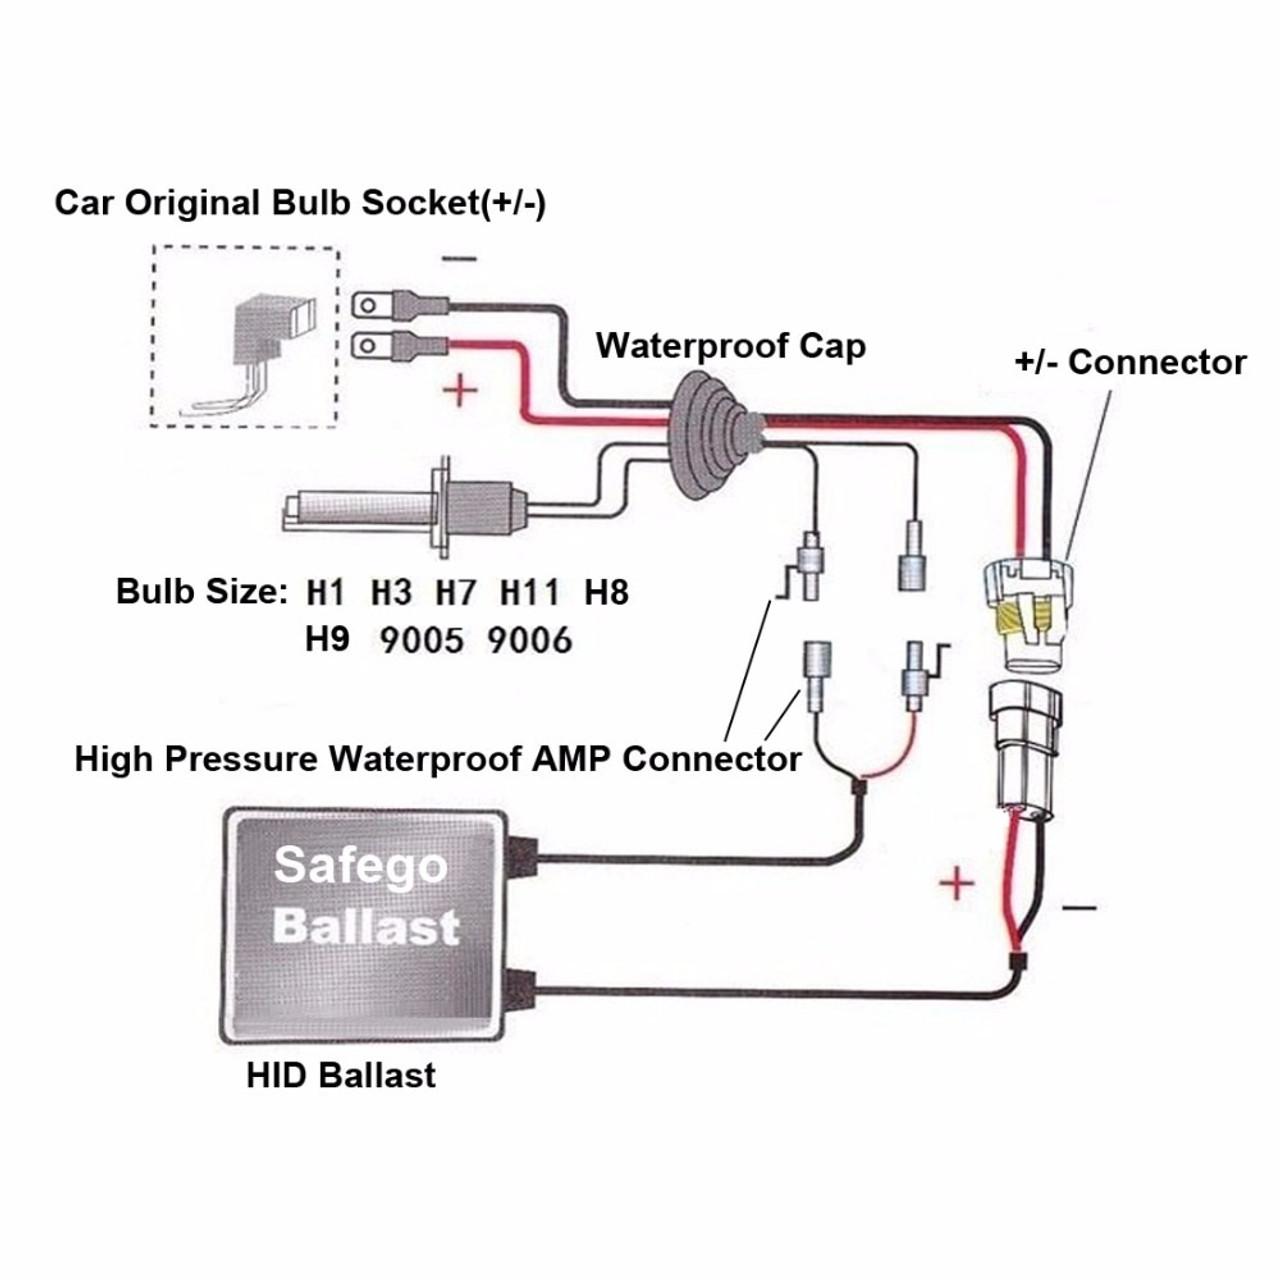 hid ballast diagram wiring diagram structure Universal Ballast Wiring Diagrams